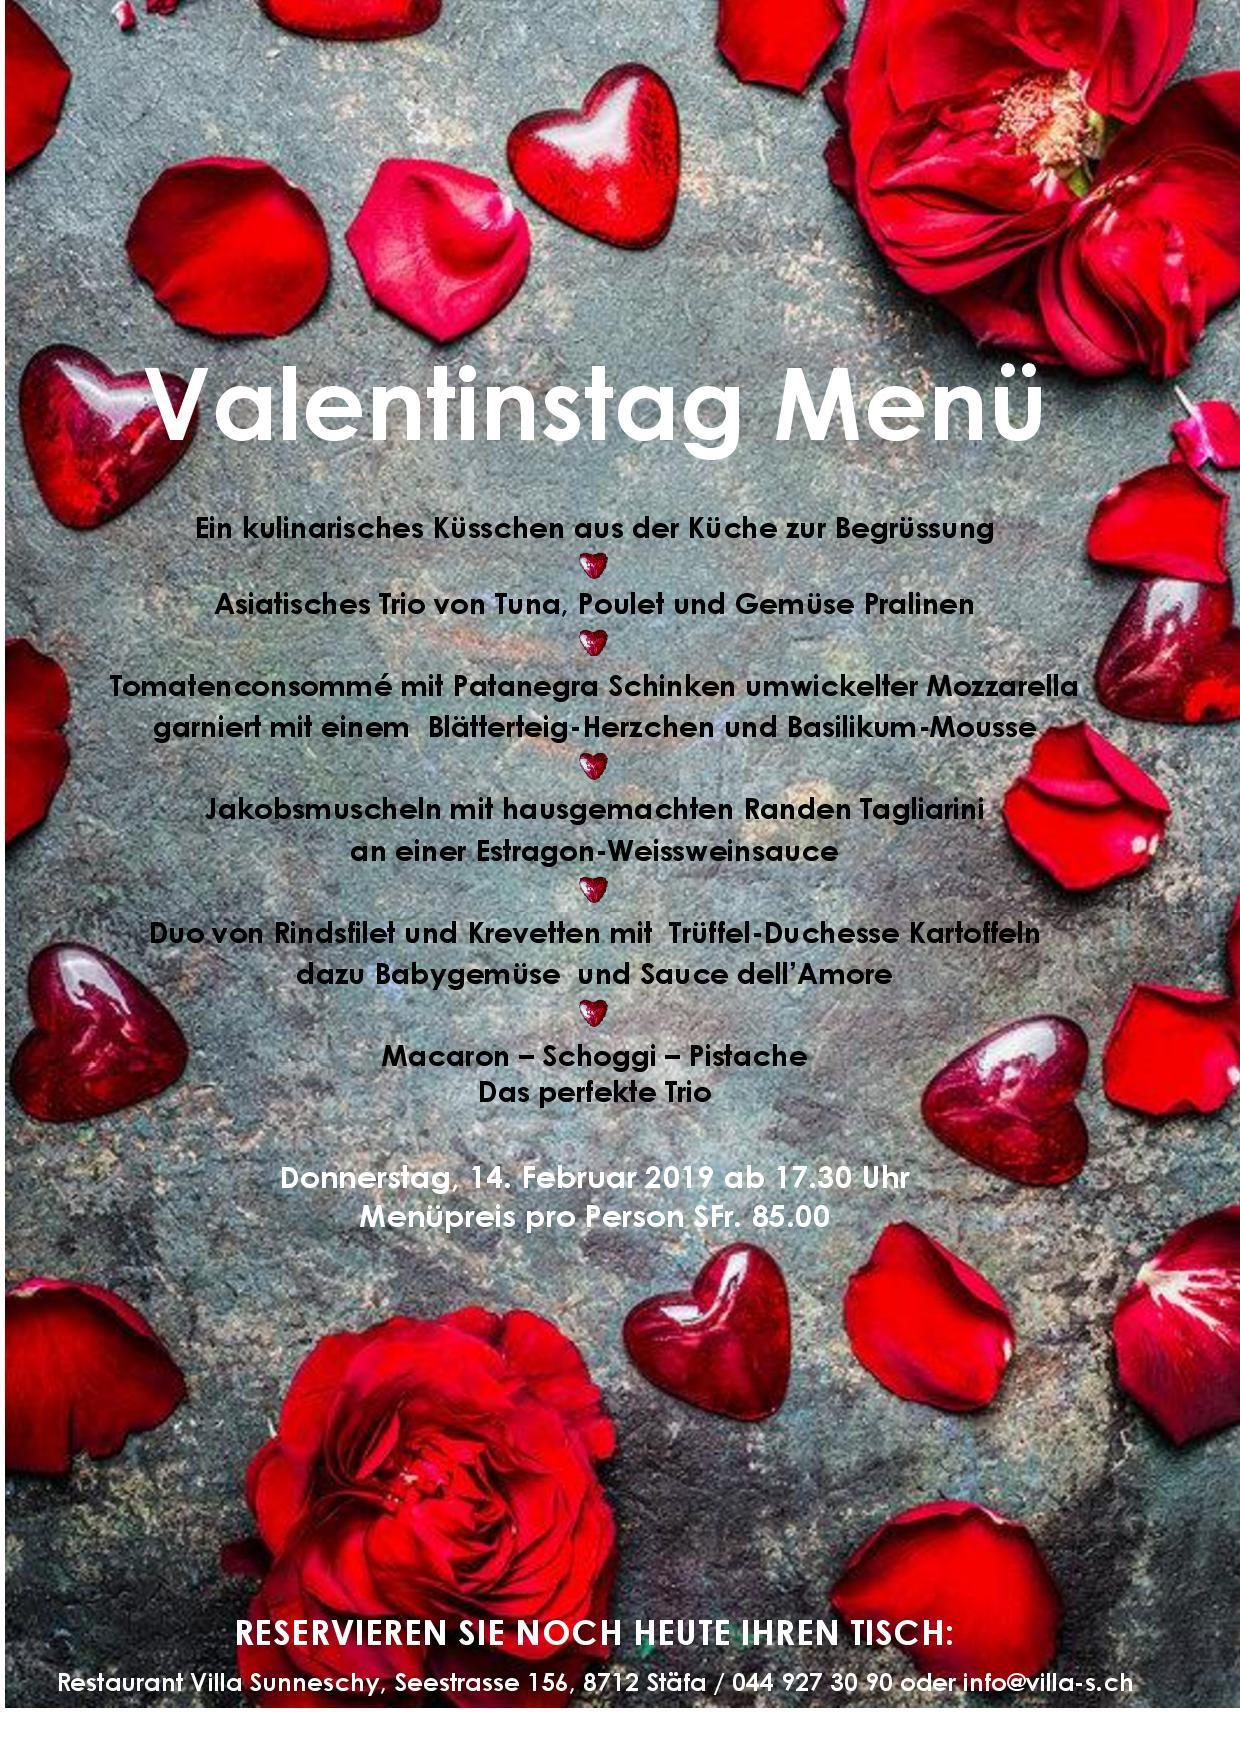 Valentinstag - Donnerstag, 14.02.2019